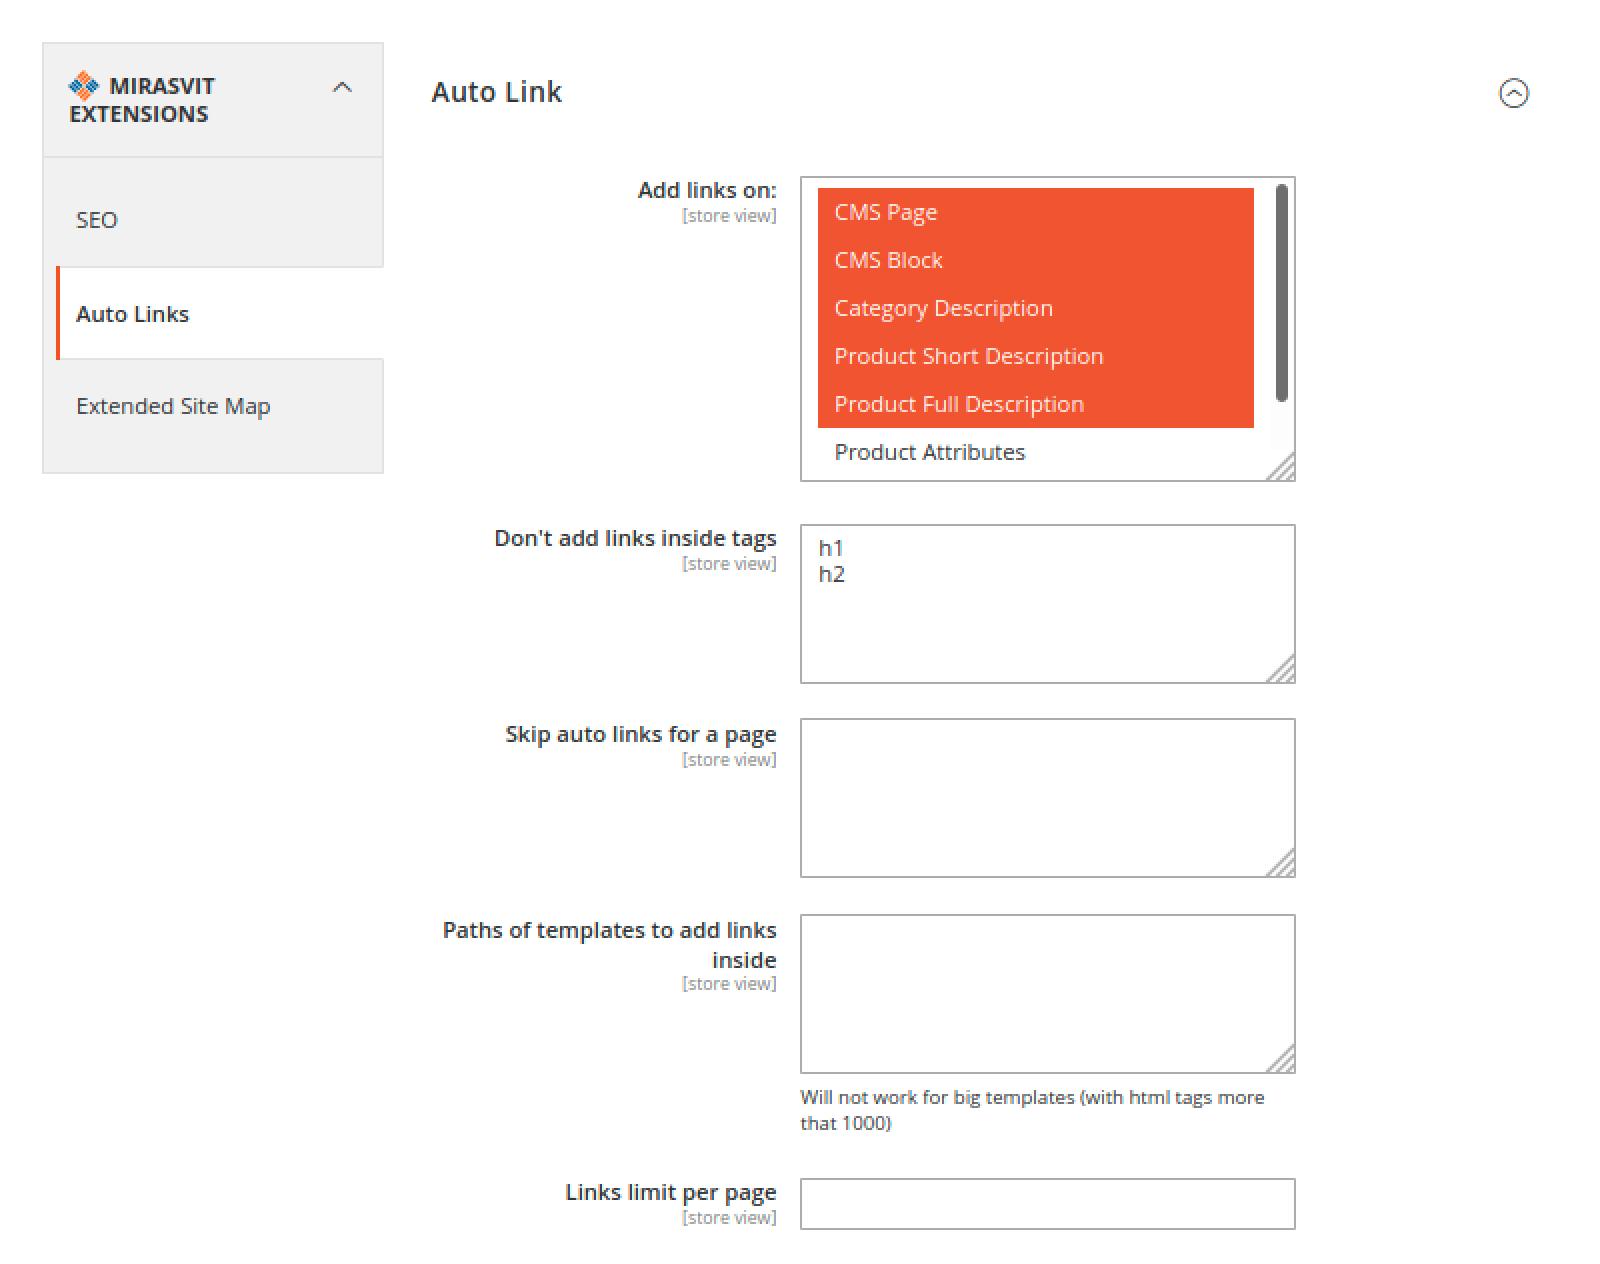 Auto Links tab in Mirasvit Advanced SEO Suite's Configuration menu